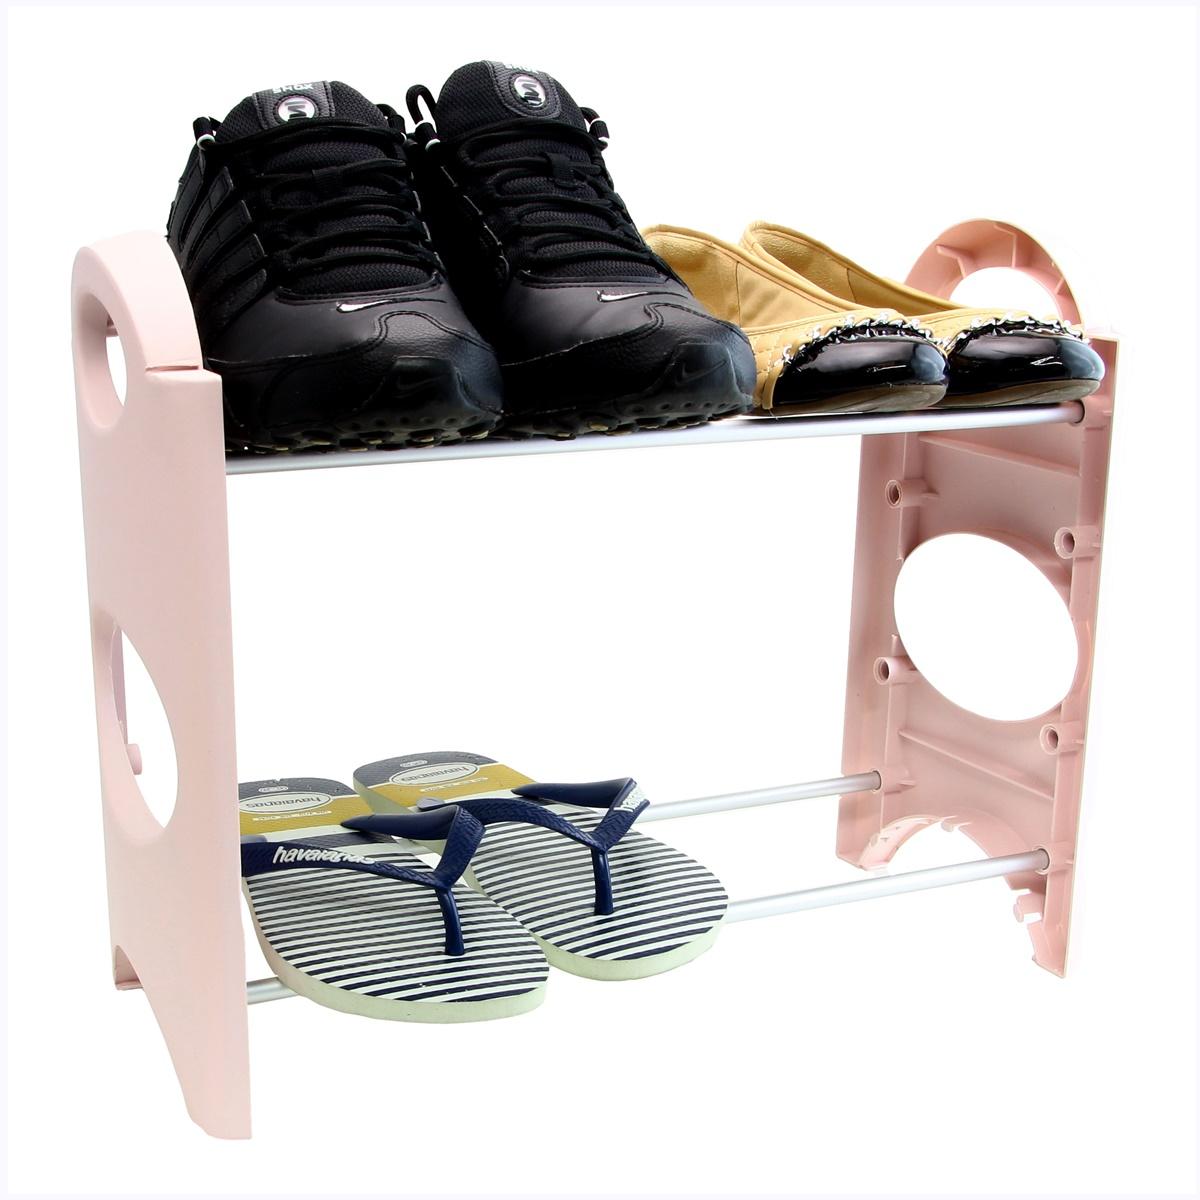 Sapateira Pequena Para Hall De Entrada Porta varias cores 8 Sapatos SAP-2A-4P-N